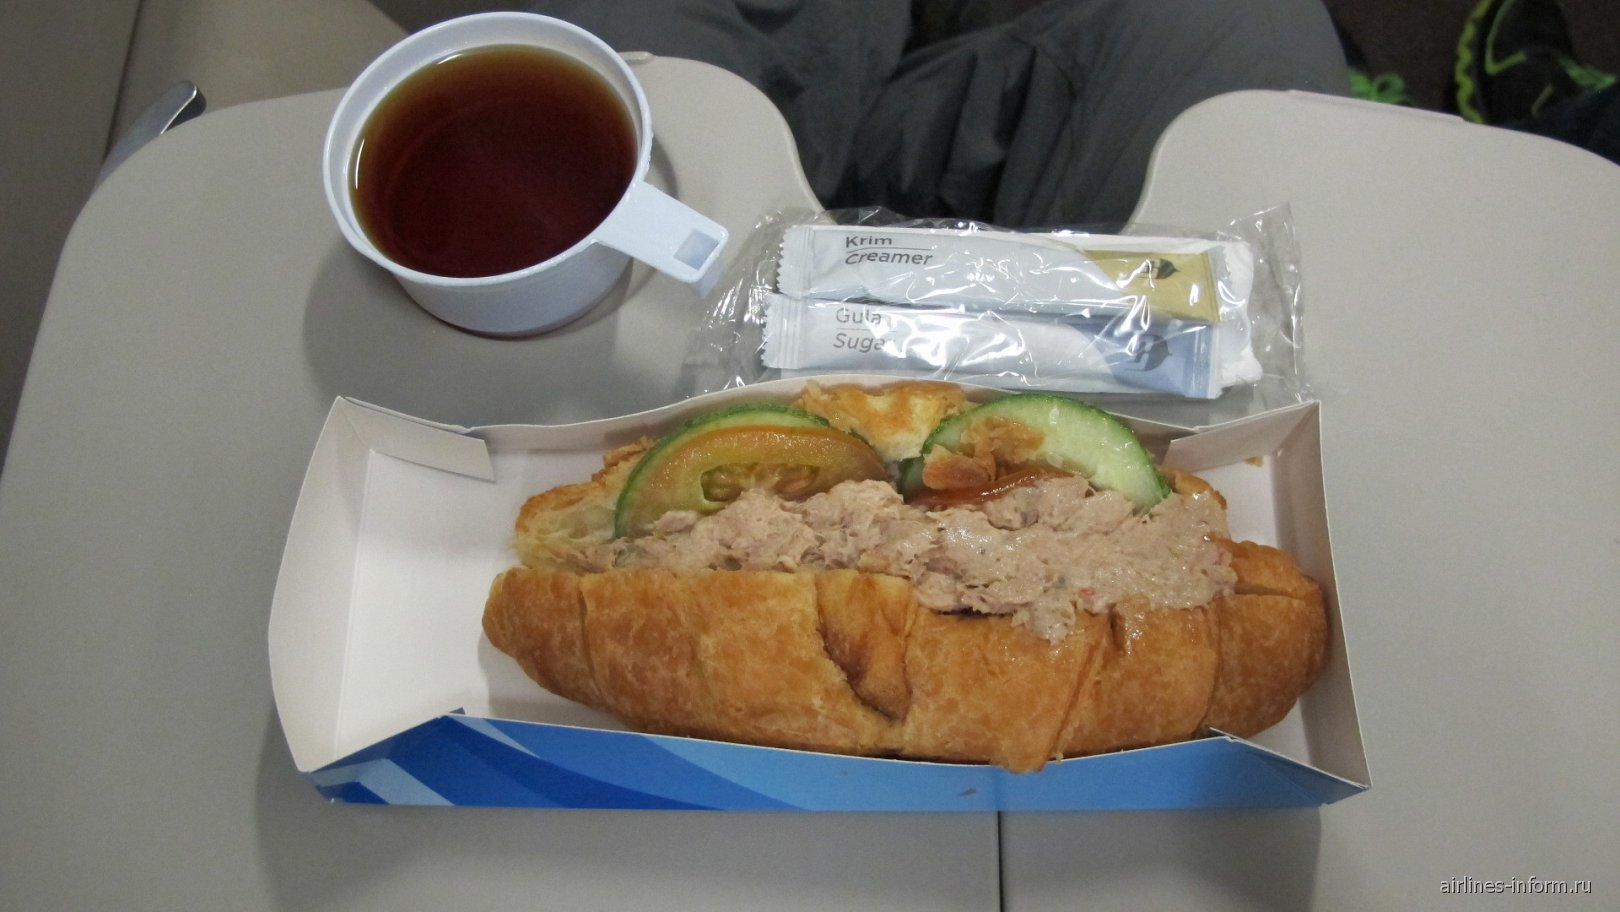 Второе питание на рейсе Малайзийских авиалиний Куала-Лумпур - Пекин